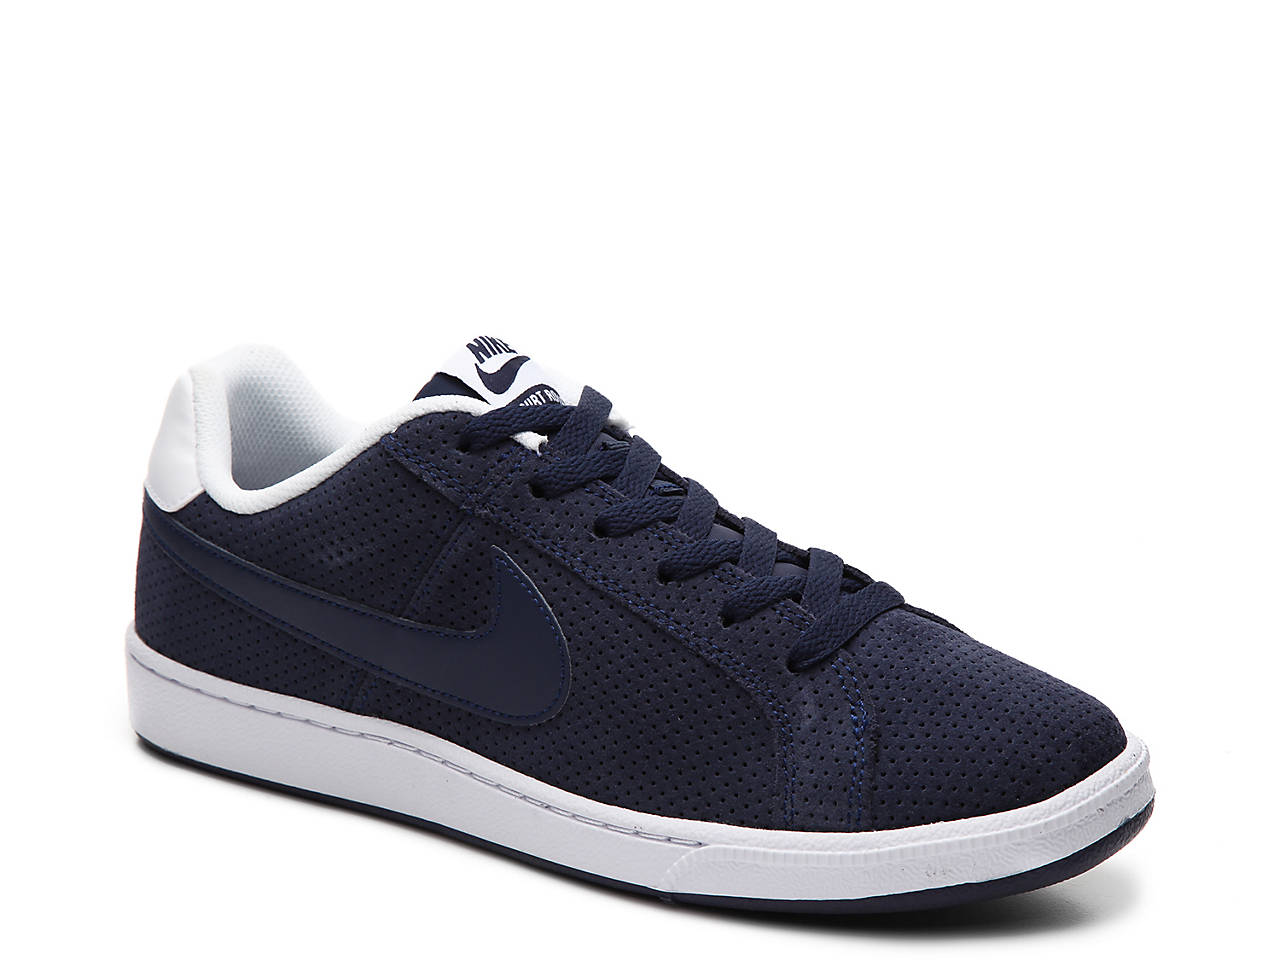 scarpe da ginnastica nike court royale camoscio uomini scarpe da uomo dsw